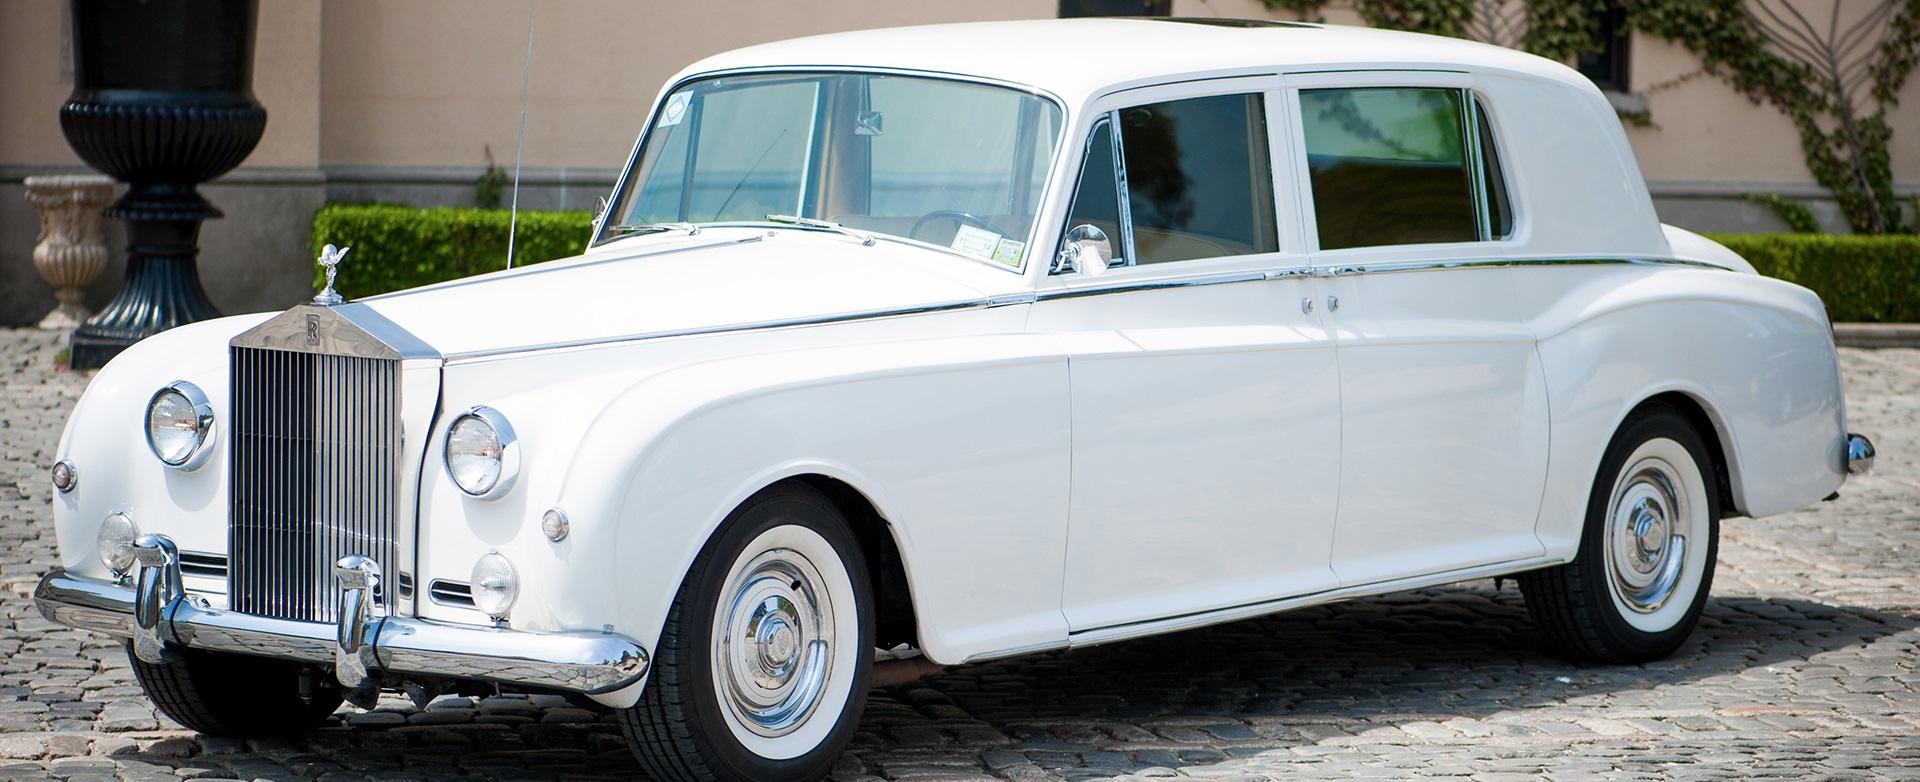 1962 Vintage Rolls Royce Phantom V Limo